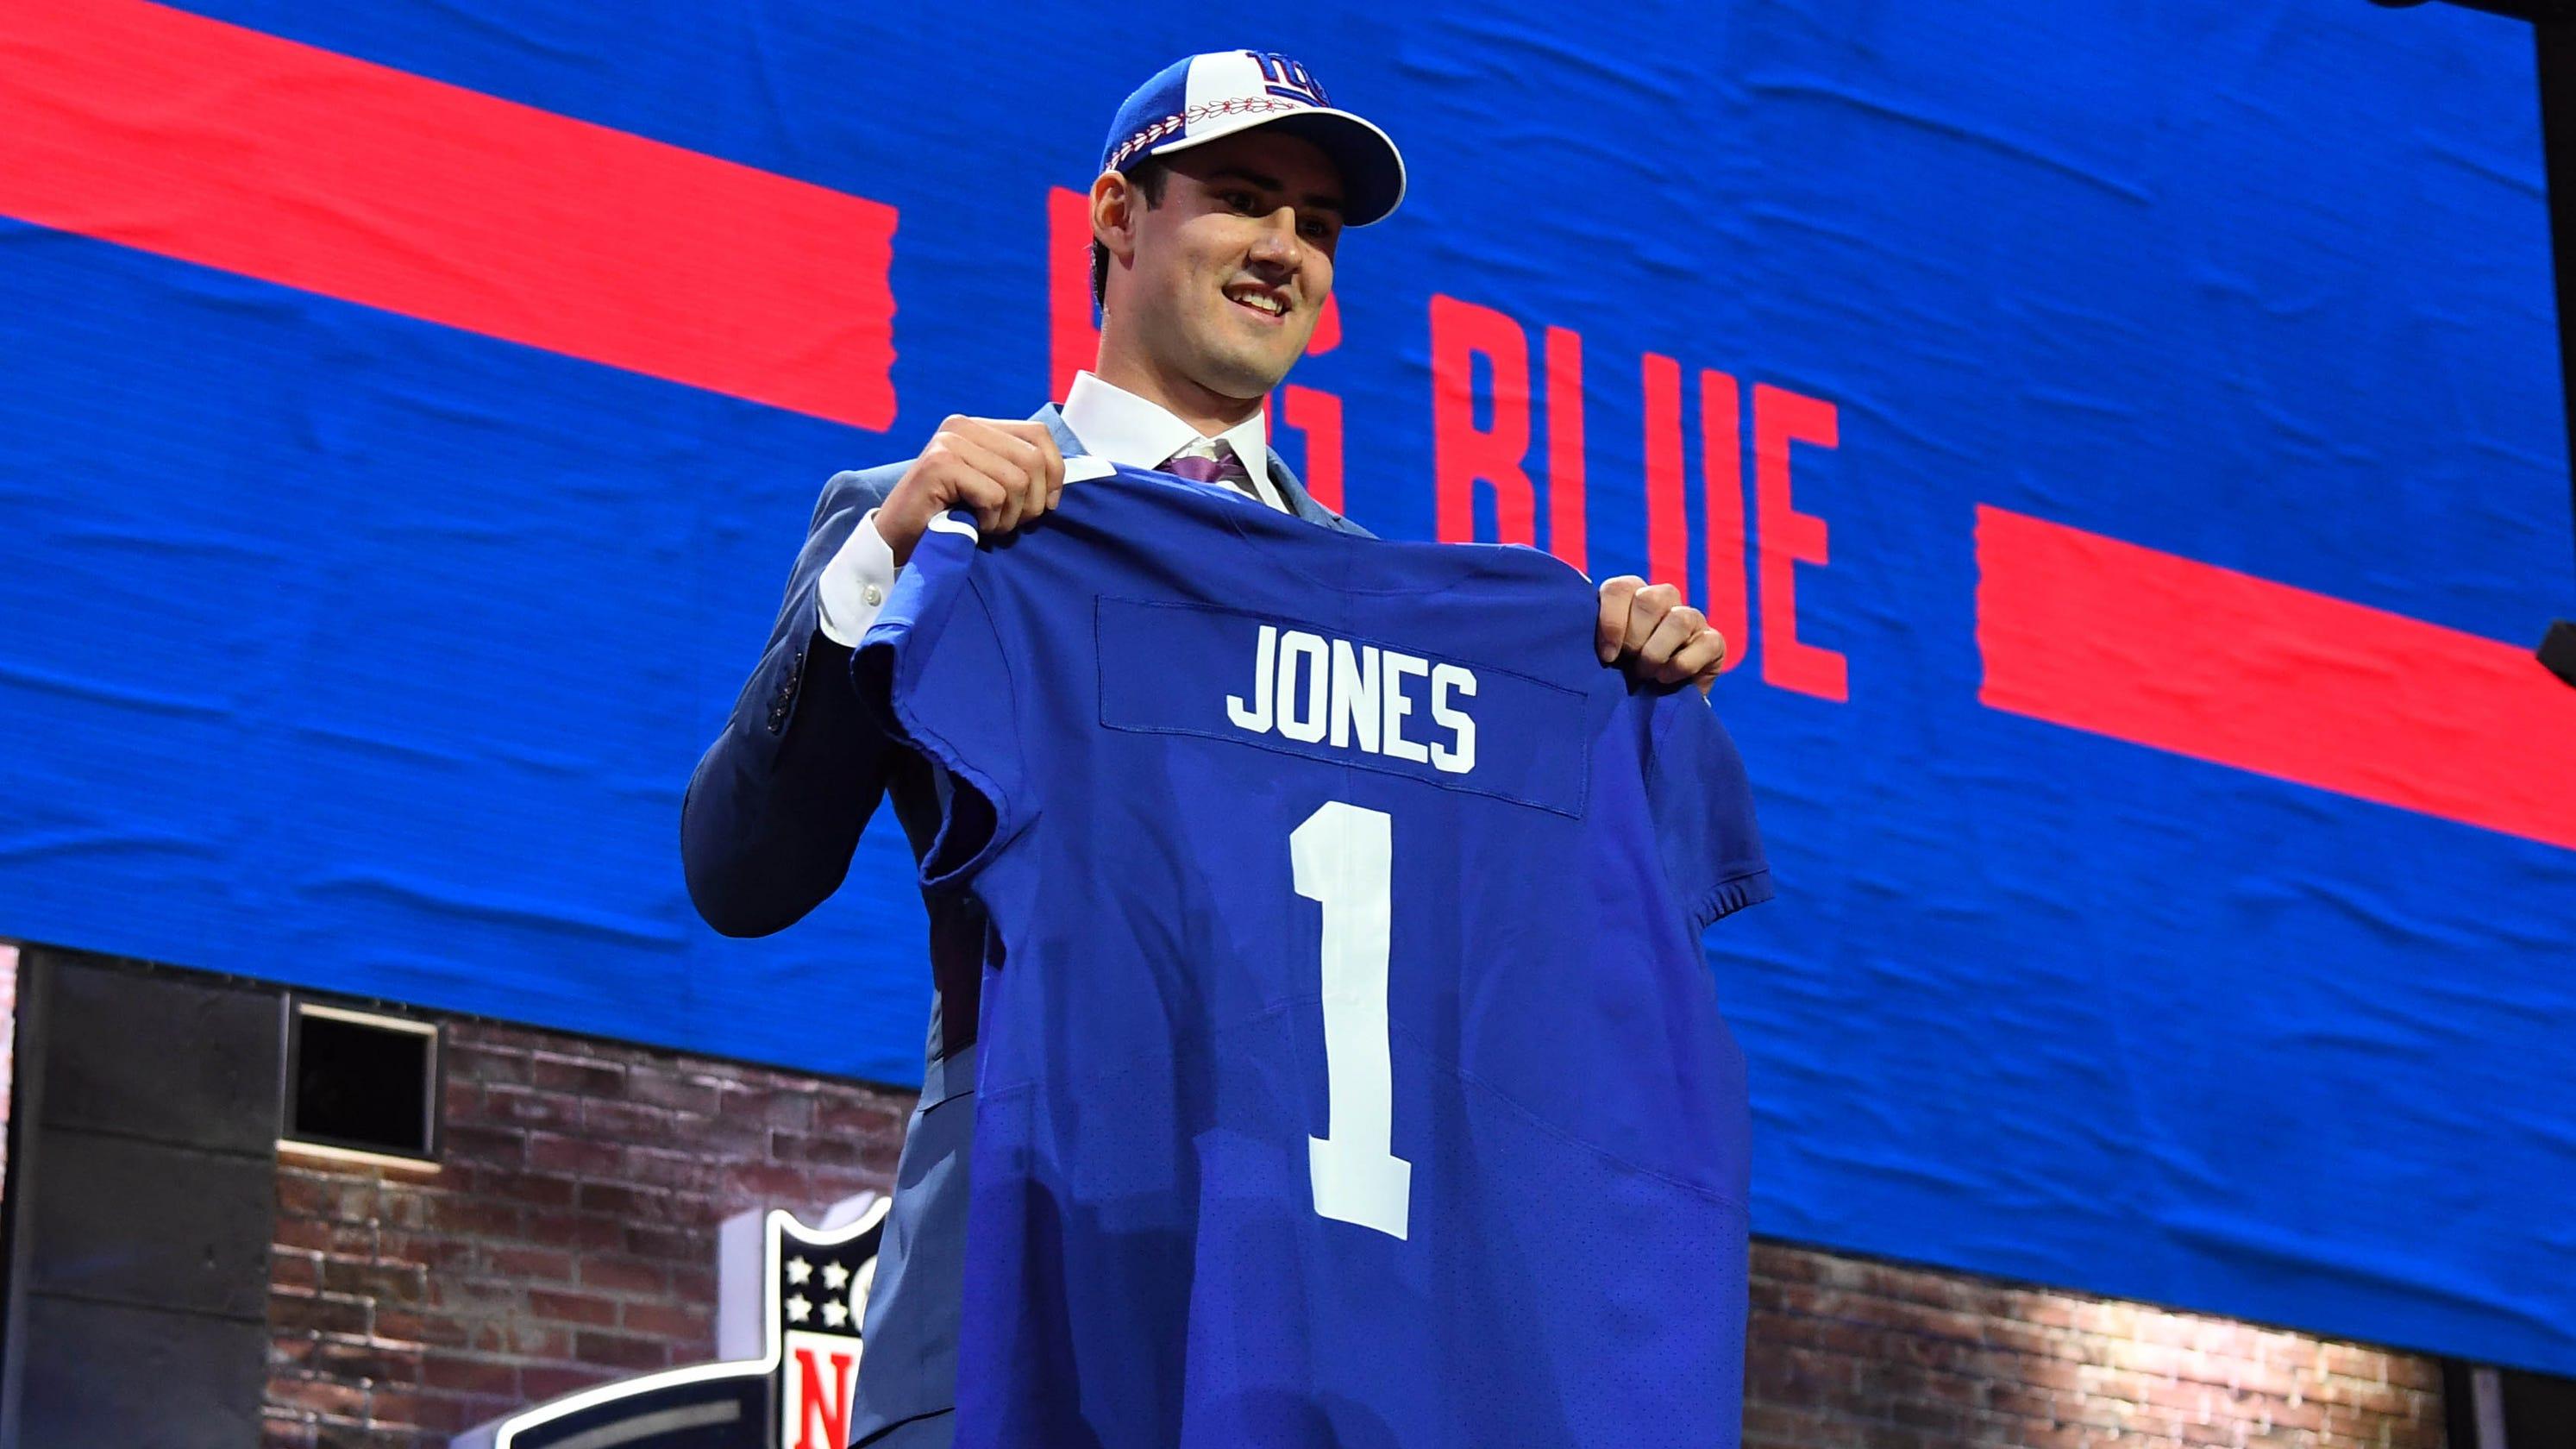 NFL draft winners, losers: Giants botch first round with Daniel Jones pick